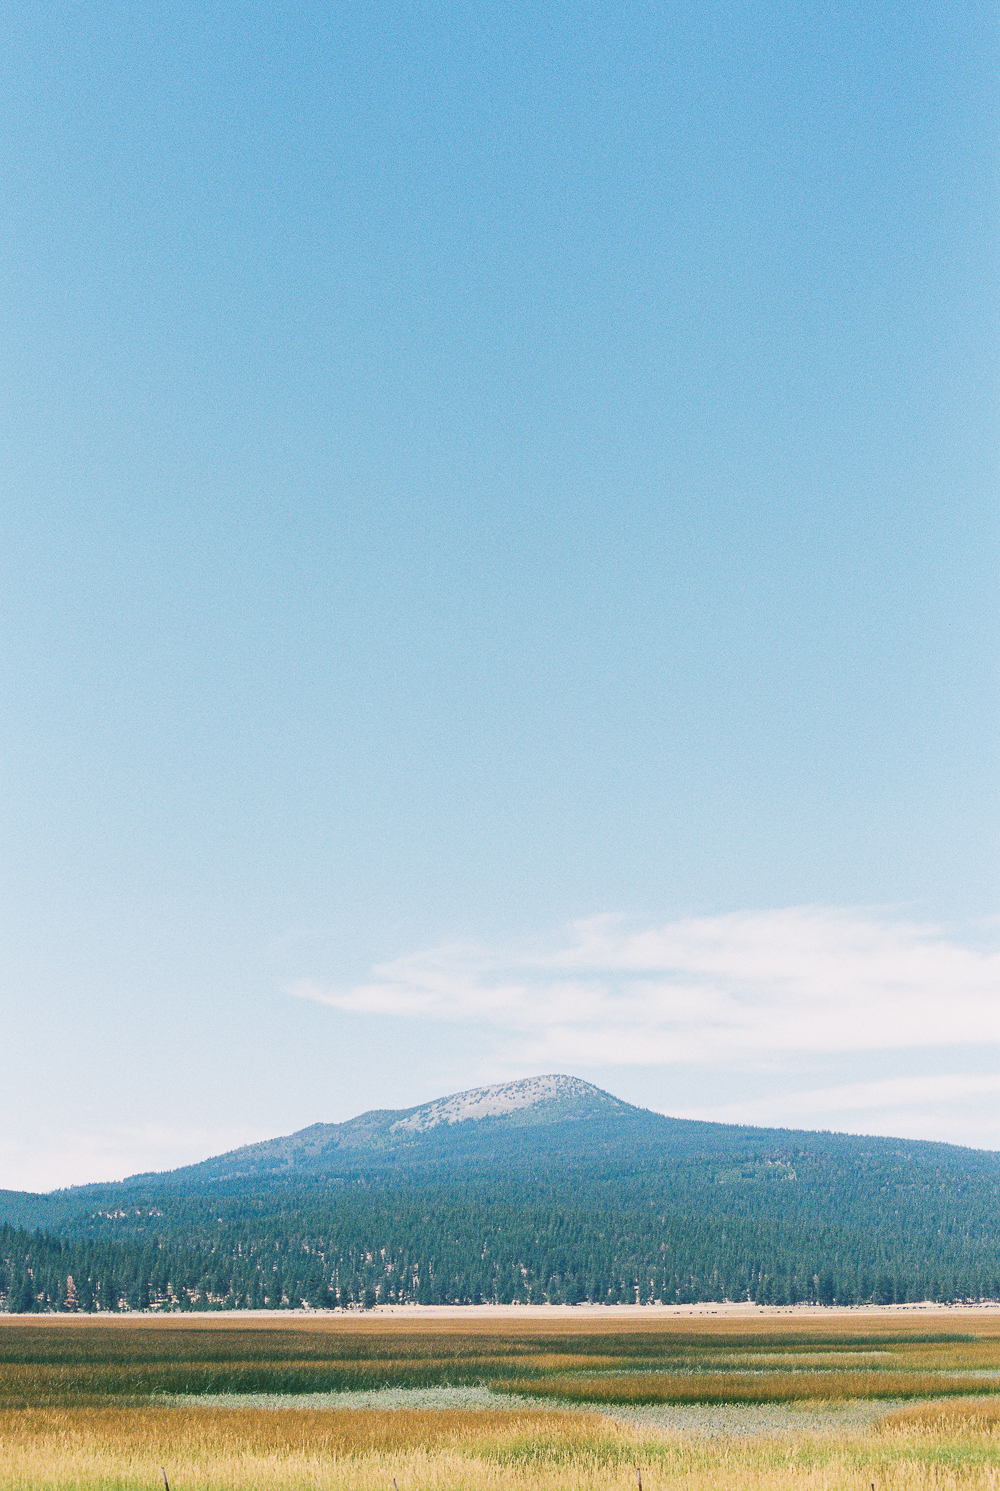 July 2017 - Portra 400 on Nikon N90s